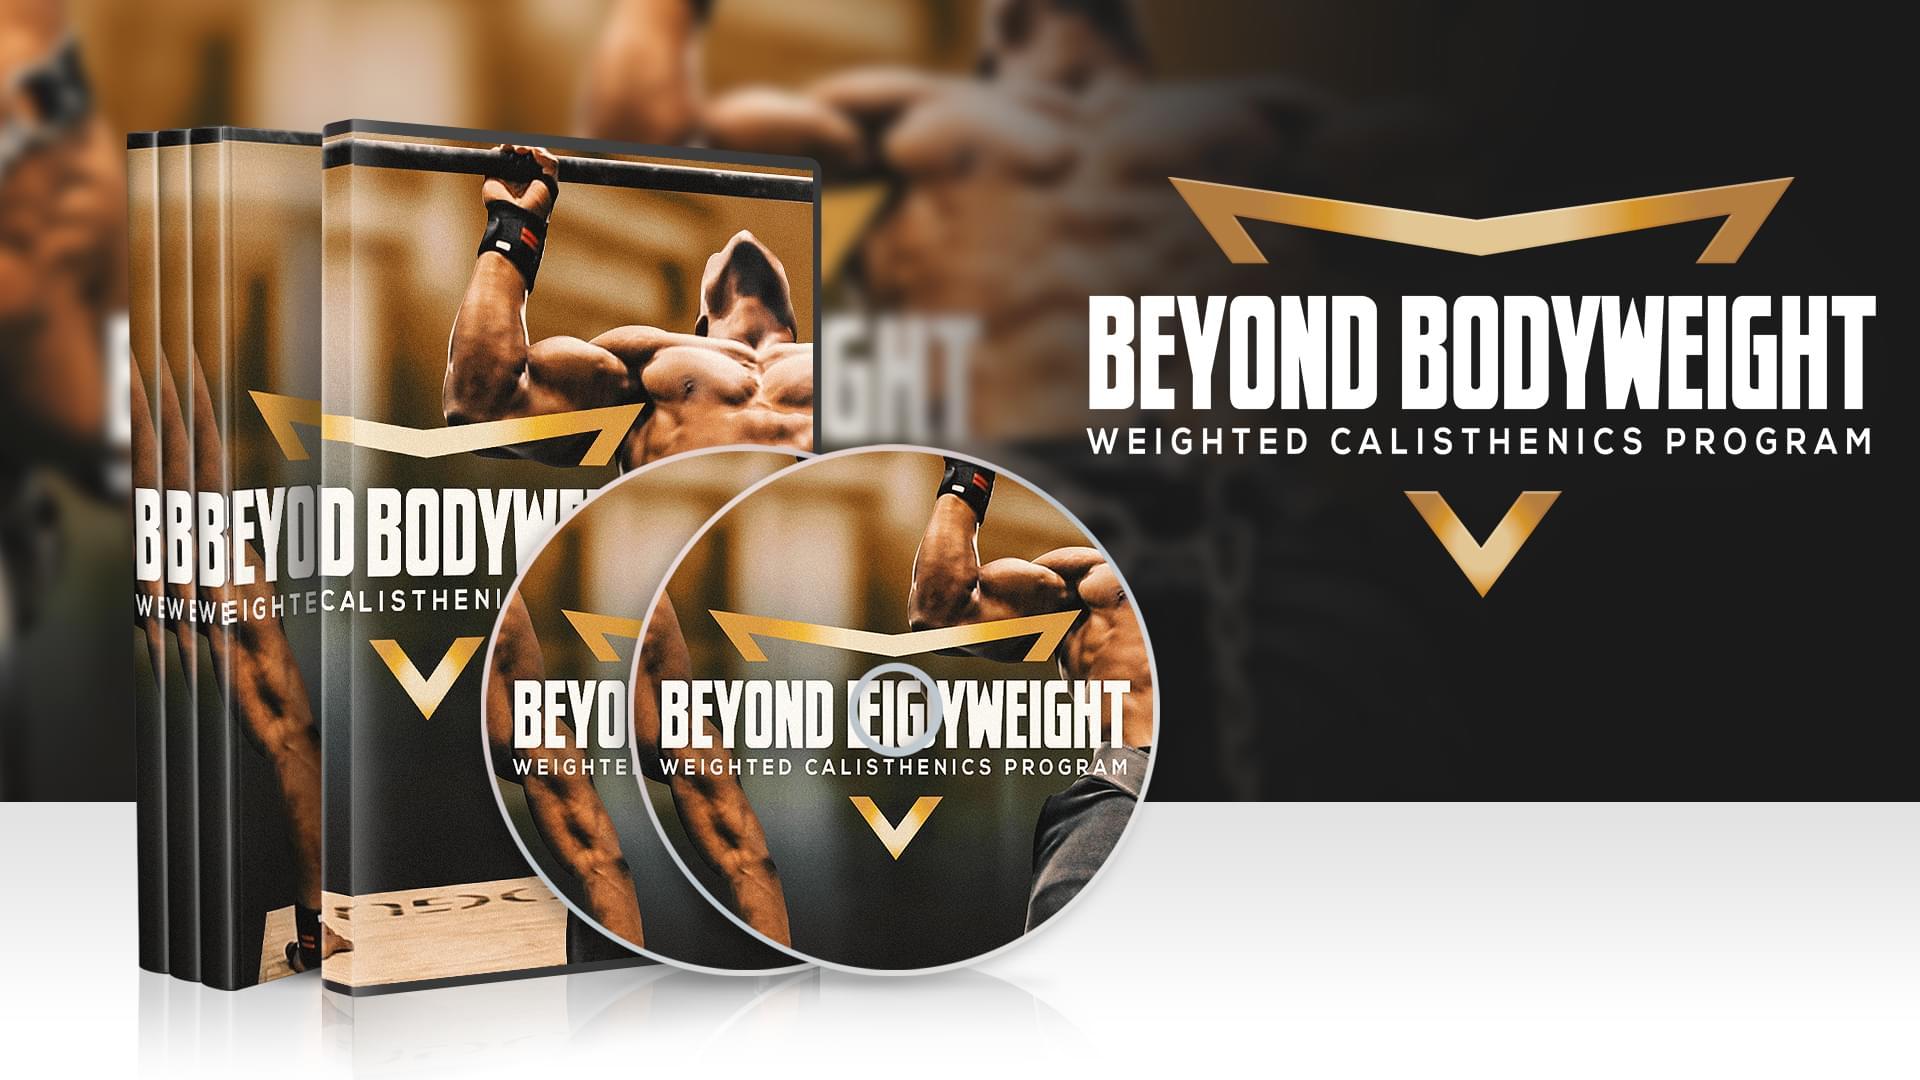 Beyond BodyWeight